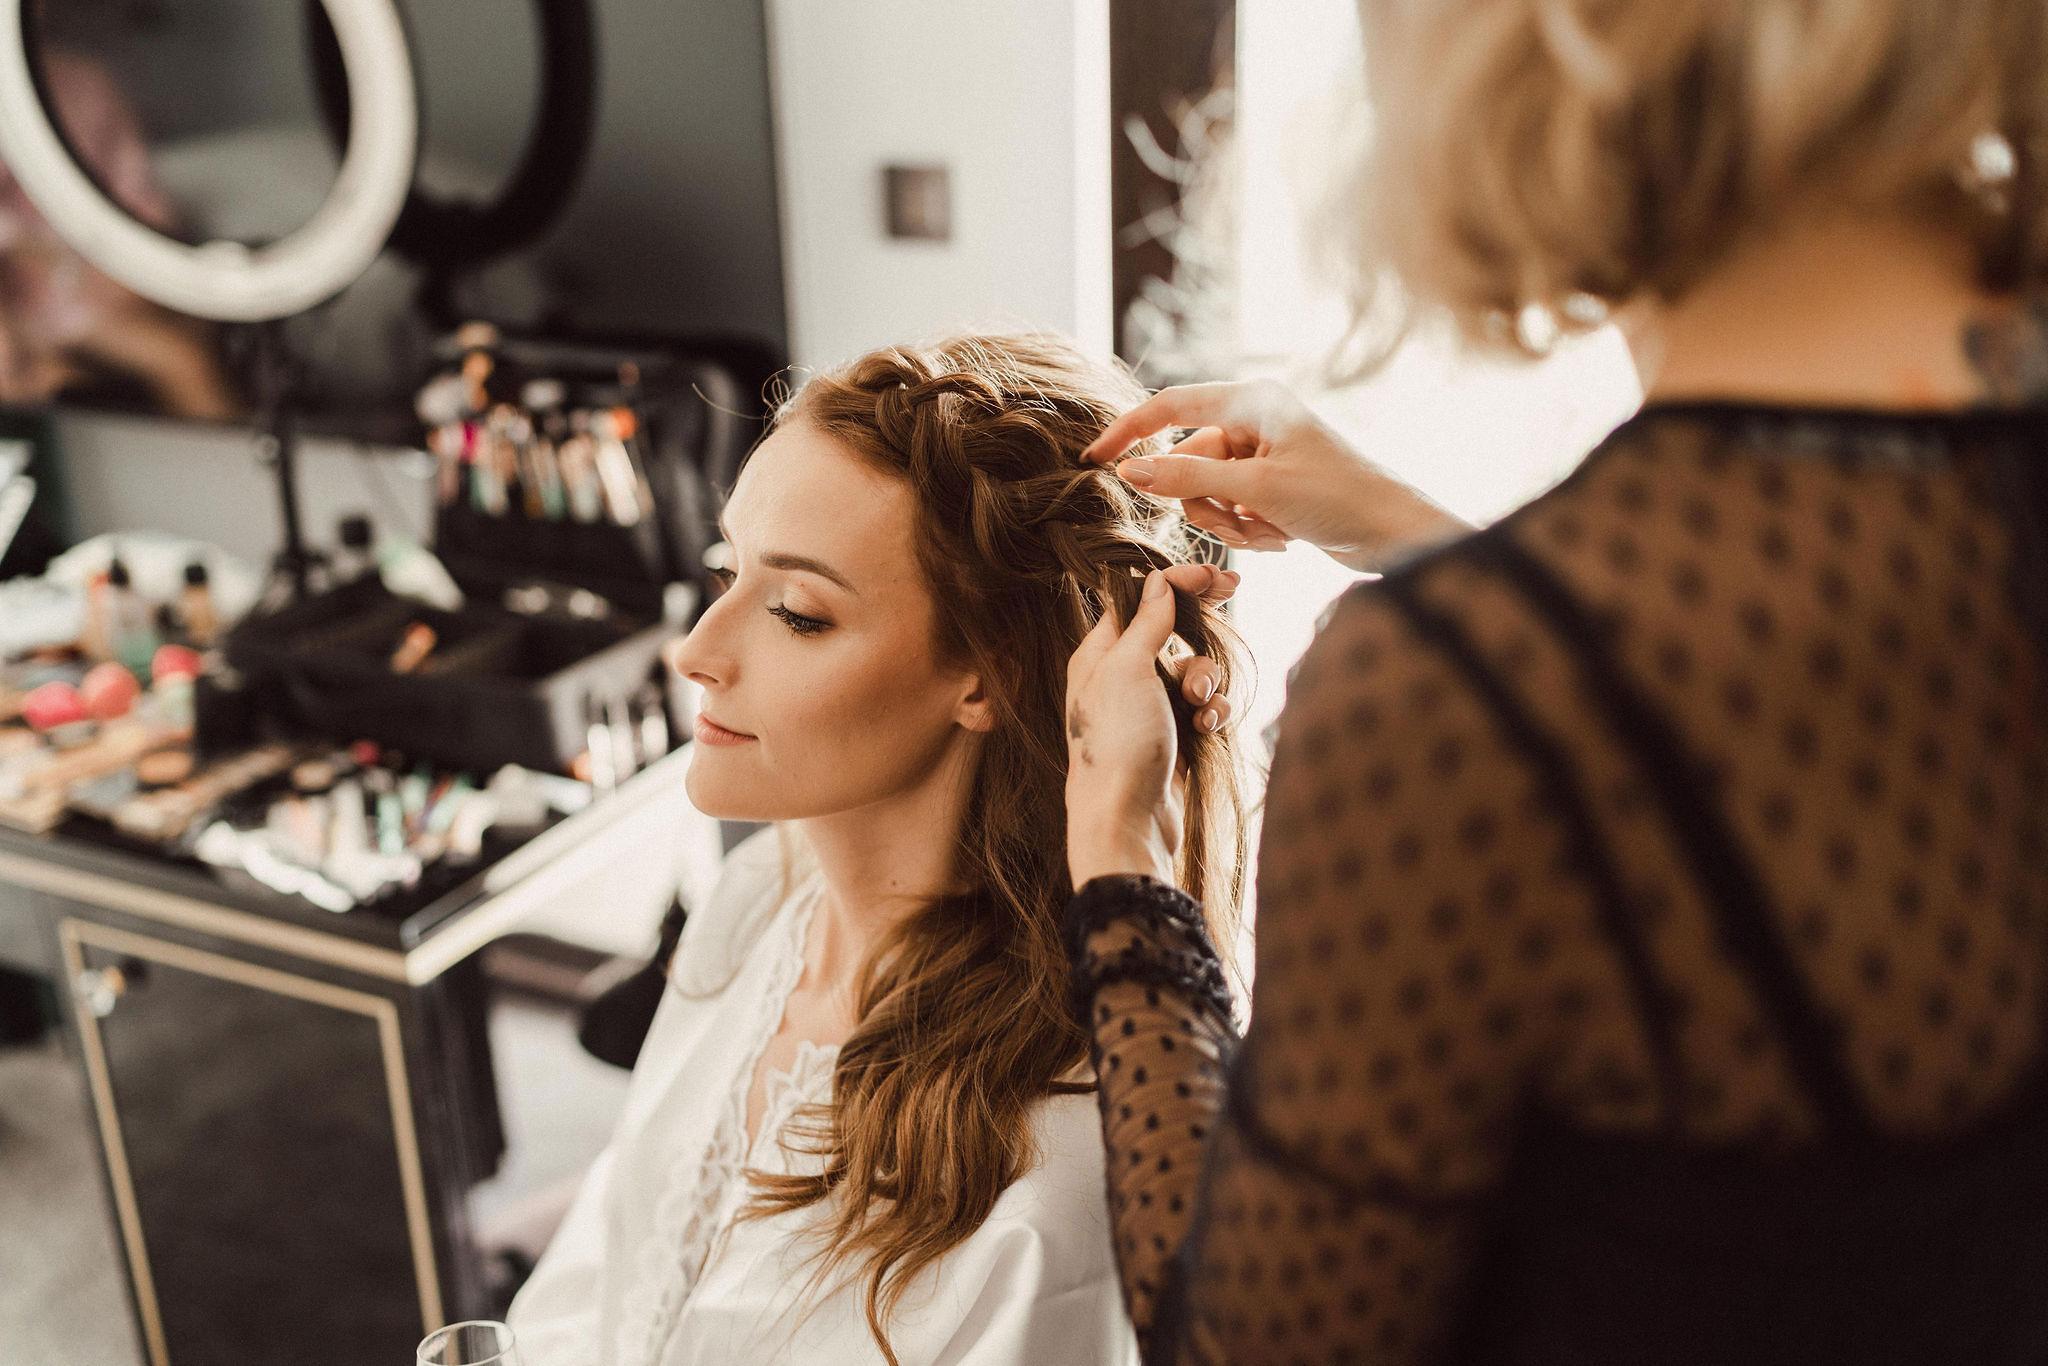 make-up-svadbajpg